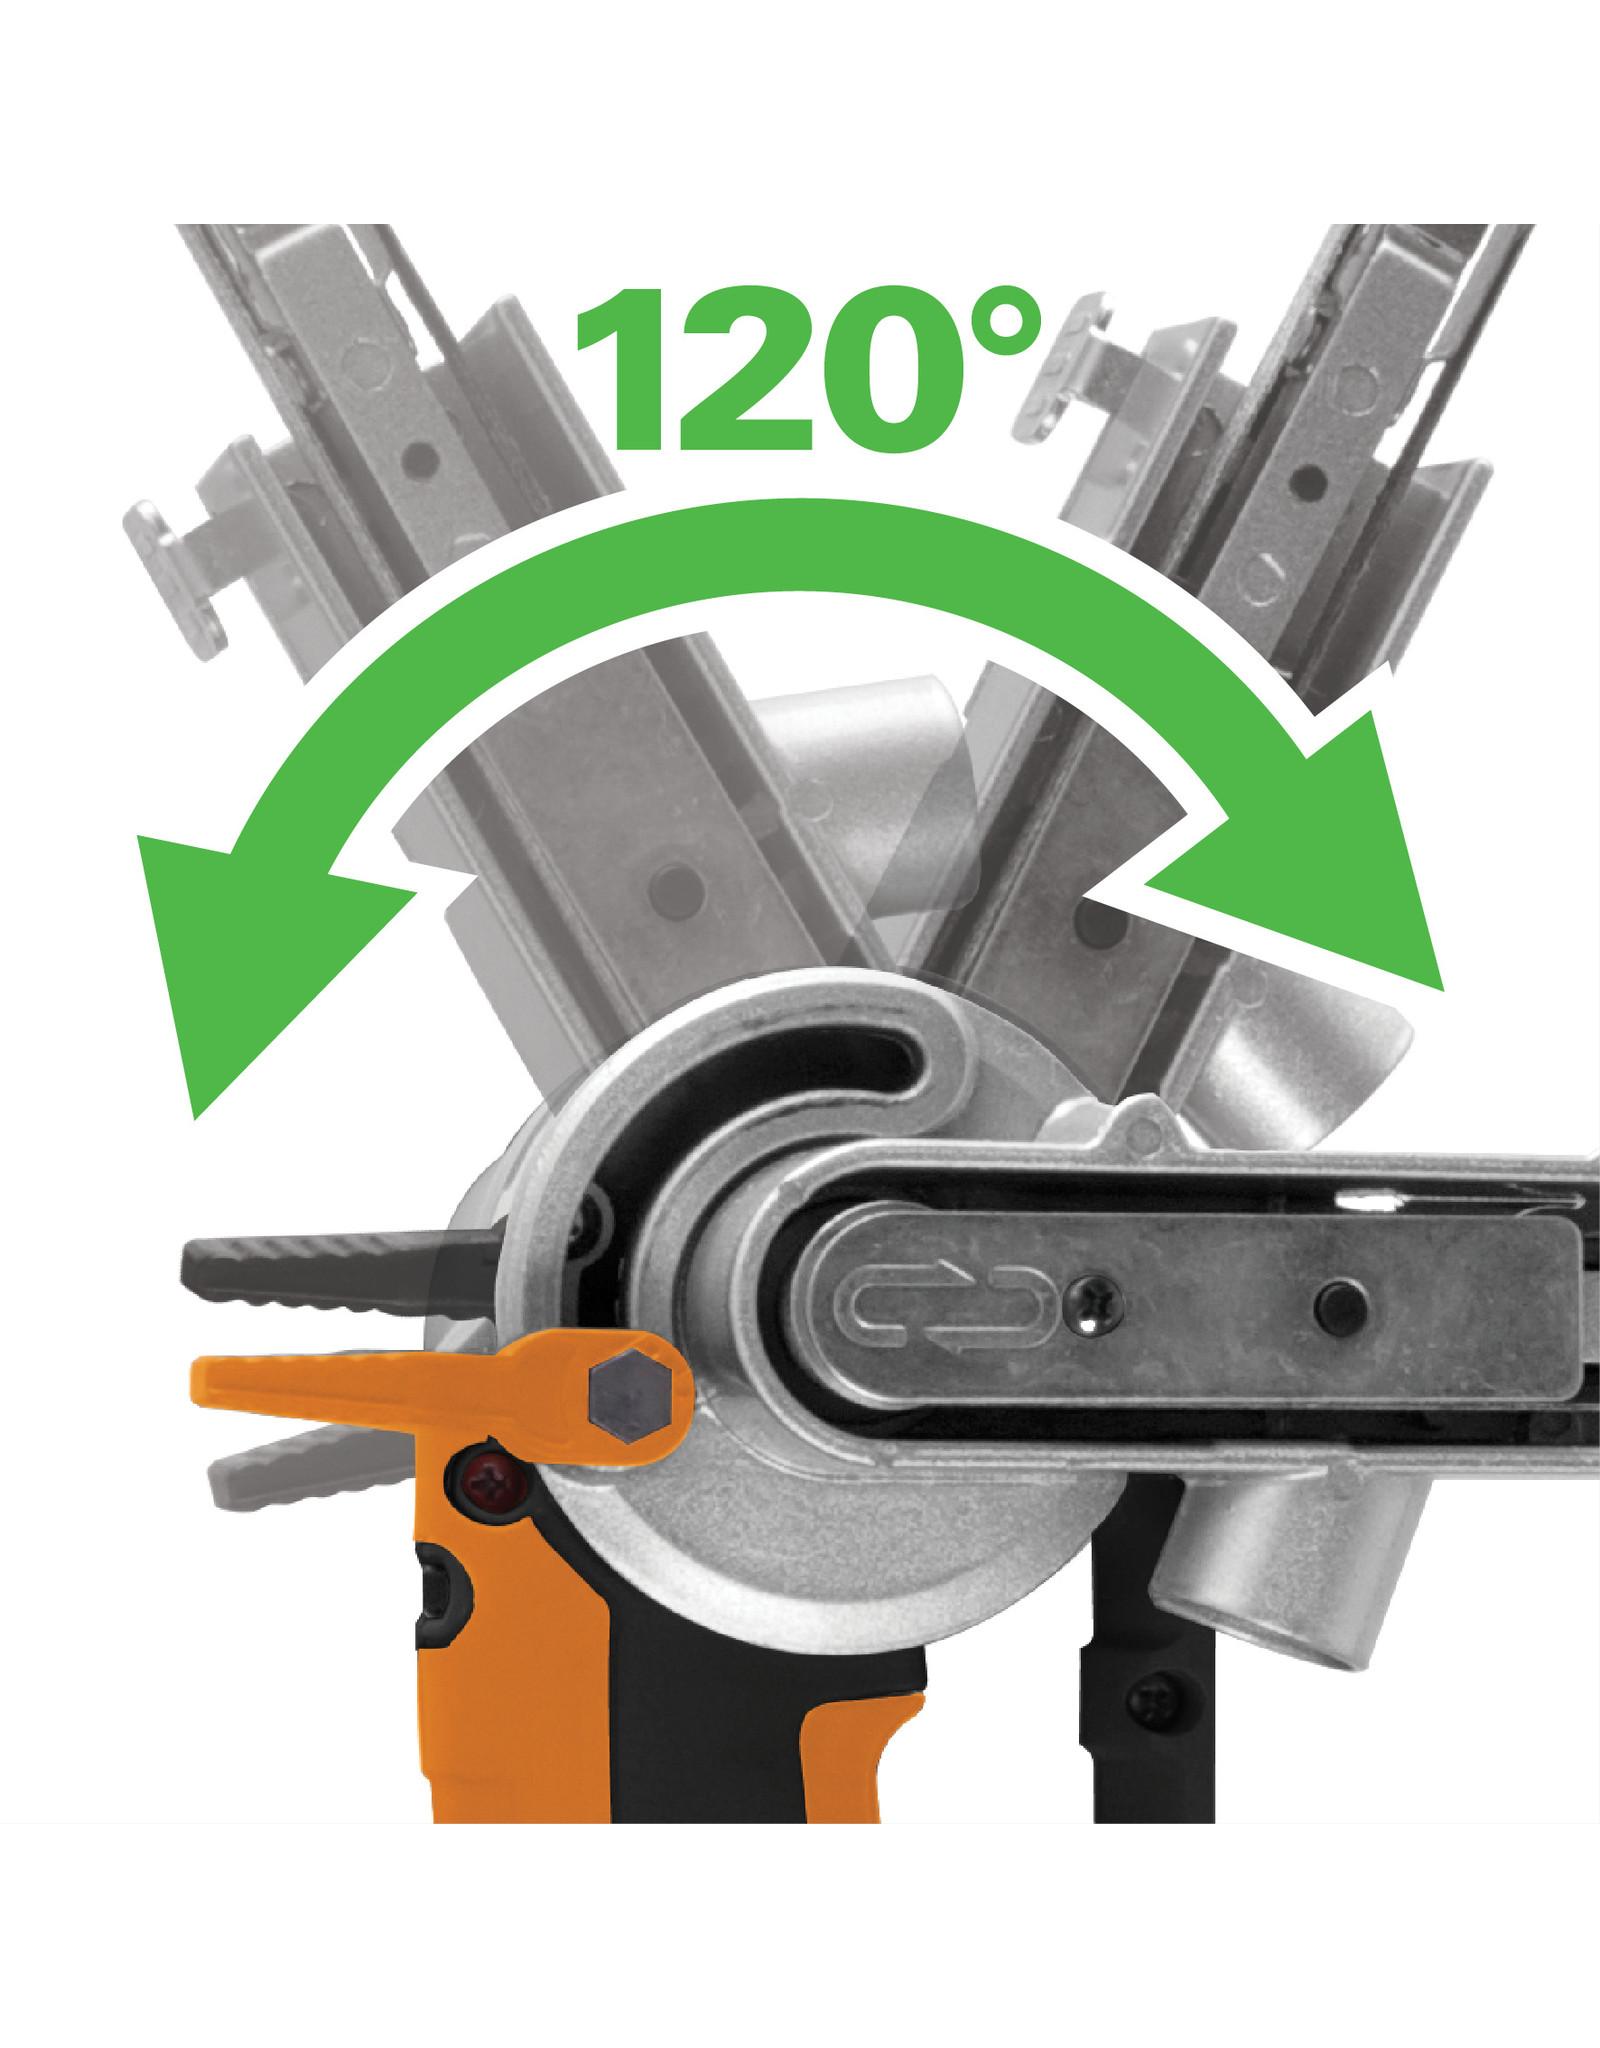 Evolution Power Tools Build Line MINI PRECISIE SCHUURMACHINE